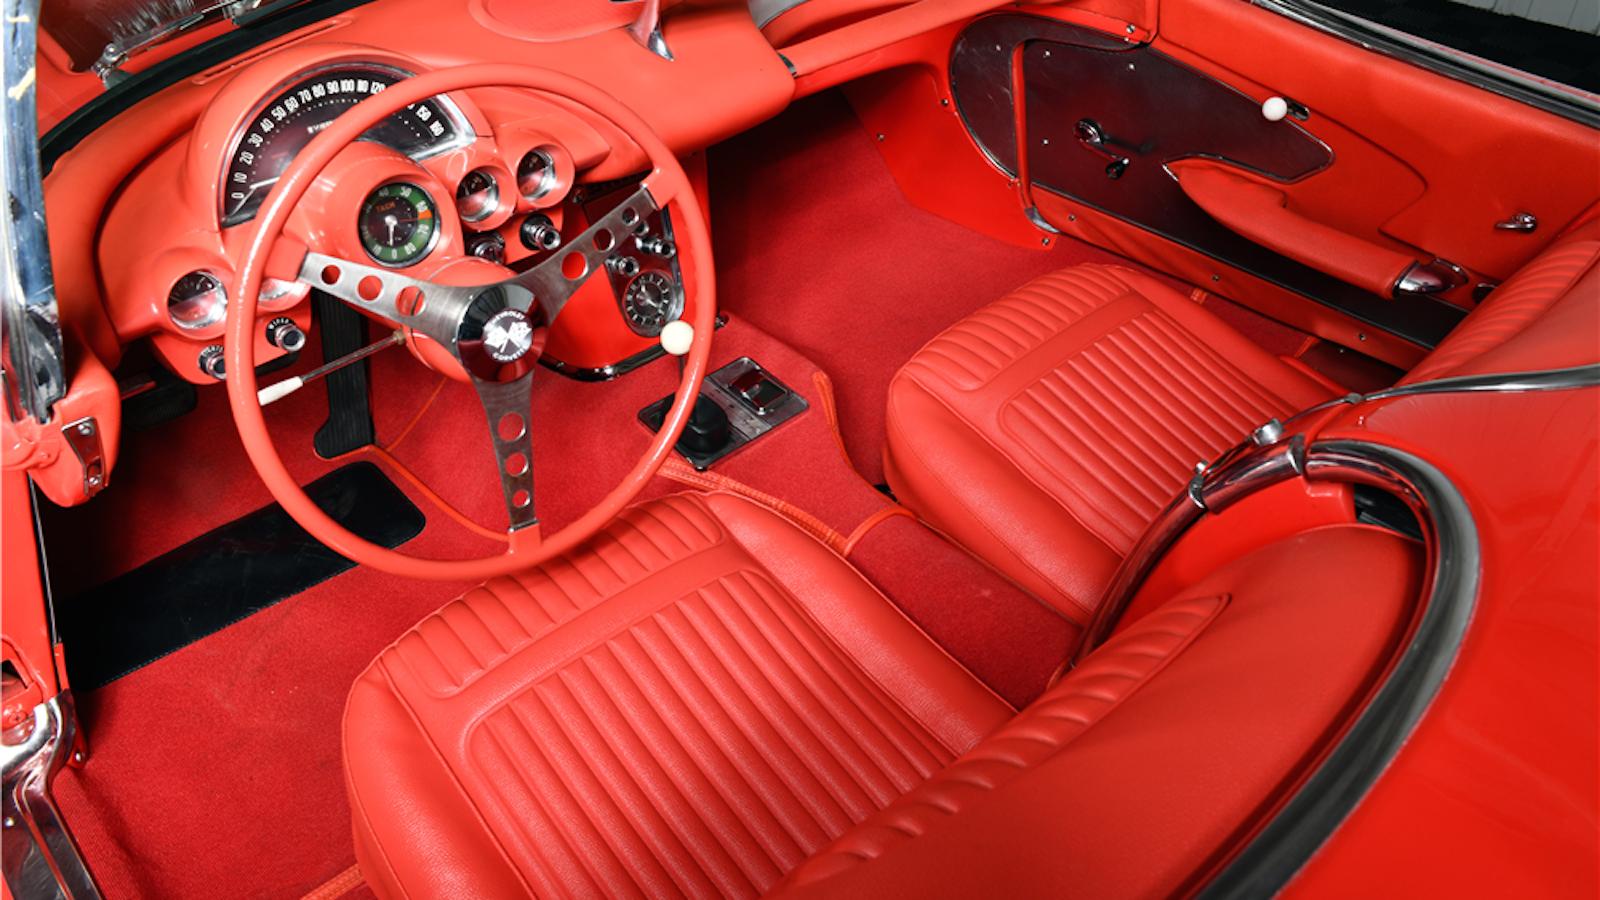 Gorgeous '58 Corvette Auctioned at Barrett Jackson